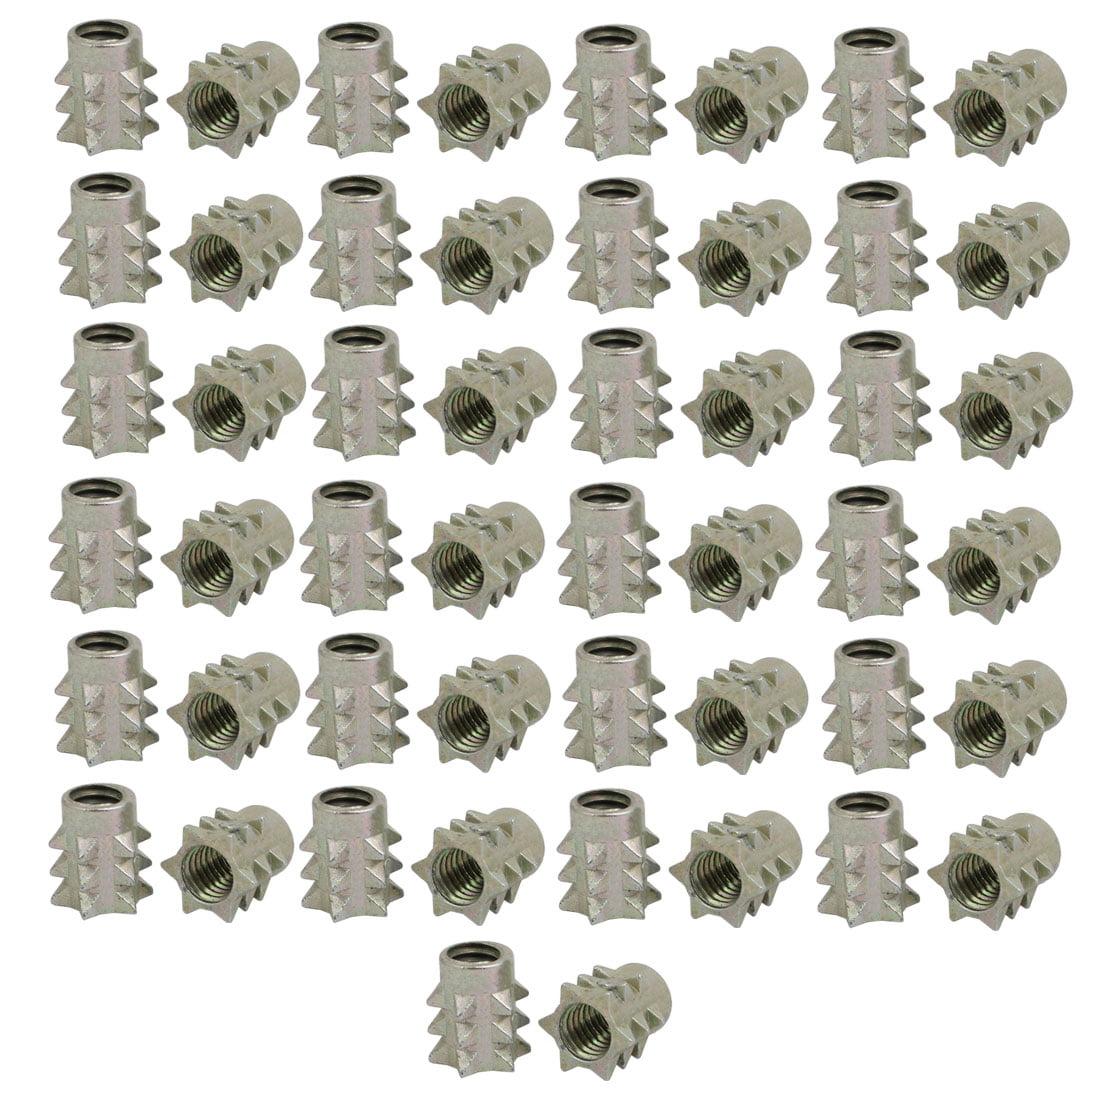 Hard-to-Find Fastener 014973382643 Grade 5 Heavy Hex Nuts 5//8-11 Piece-91 Midwest Fastener Corp